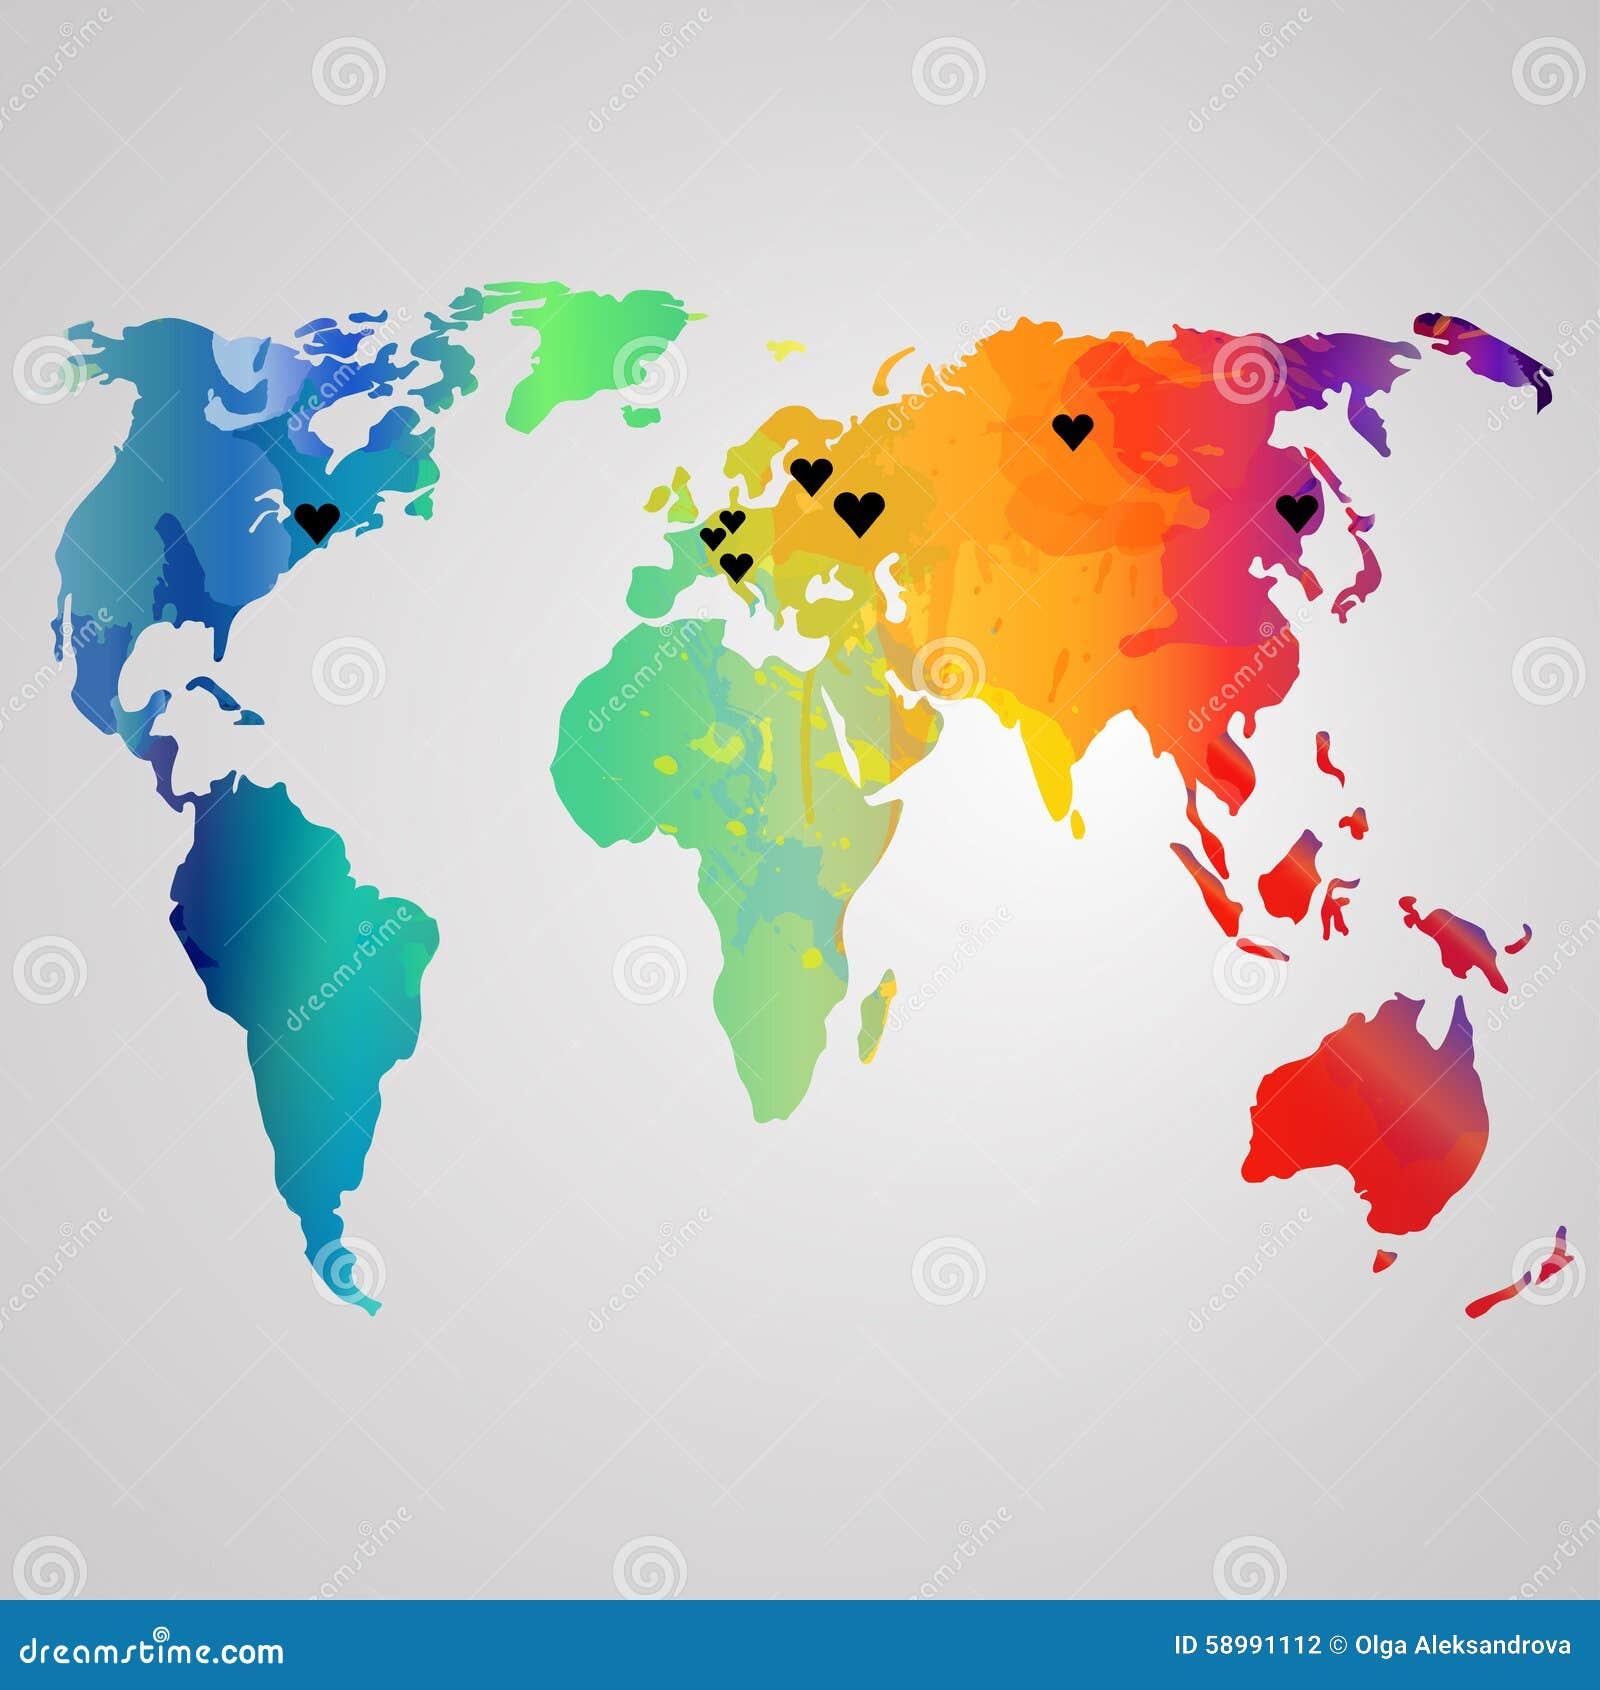 world map watercolor vector illustration rainbow stock. Black Bedroom Furniture Sets. Home Design Ideas